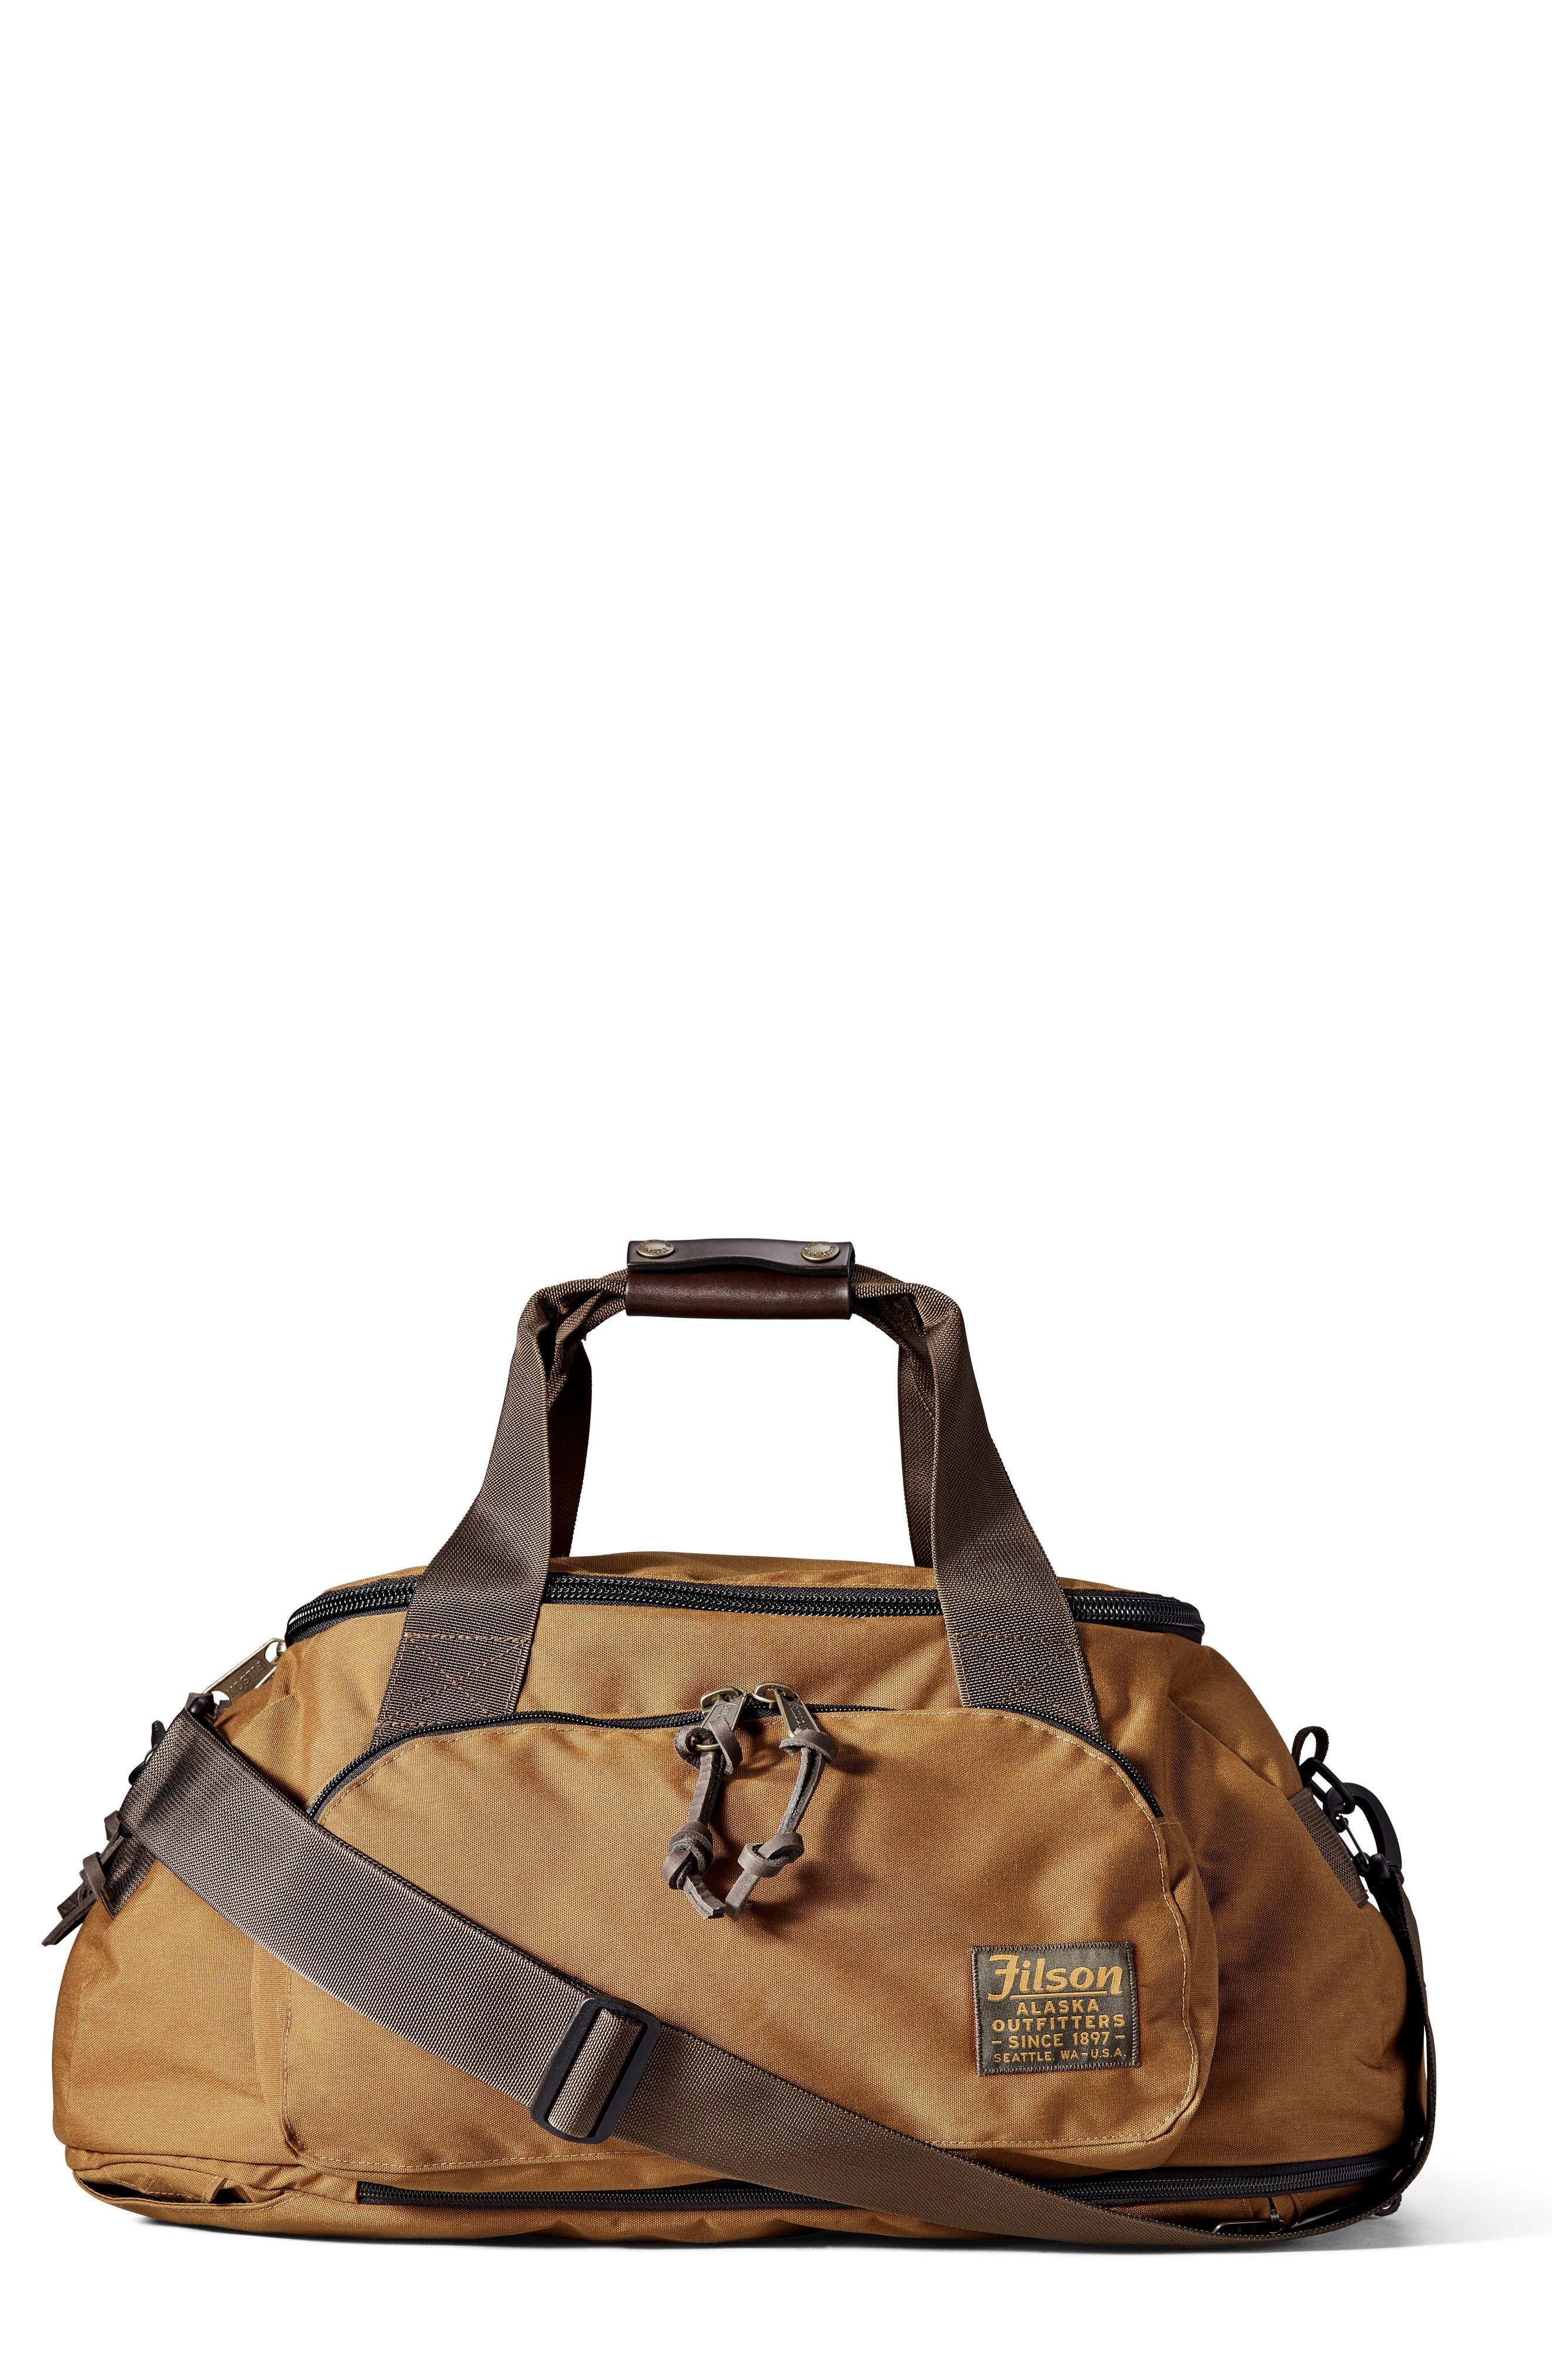 Convertible Duffel Bag,                             Main thumbnail 1, color,                             200